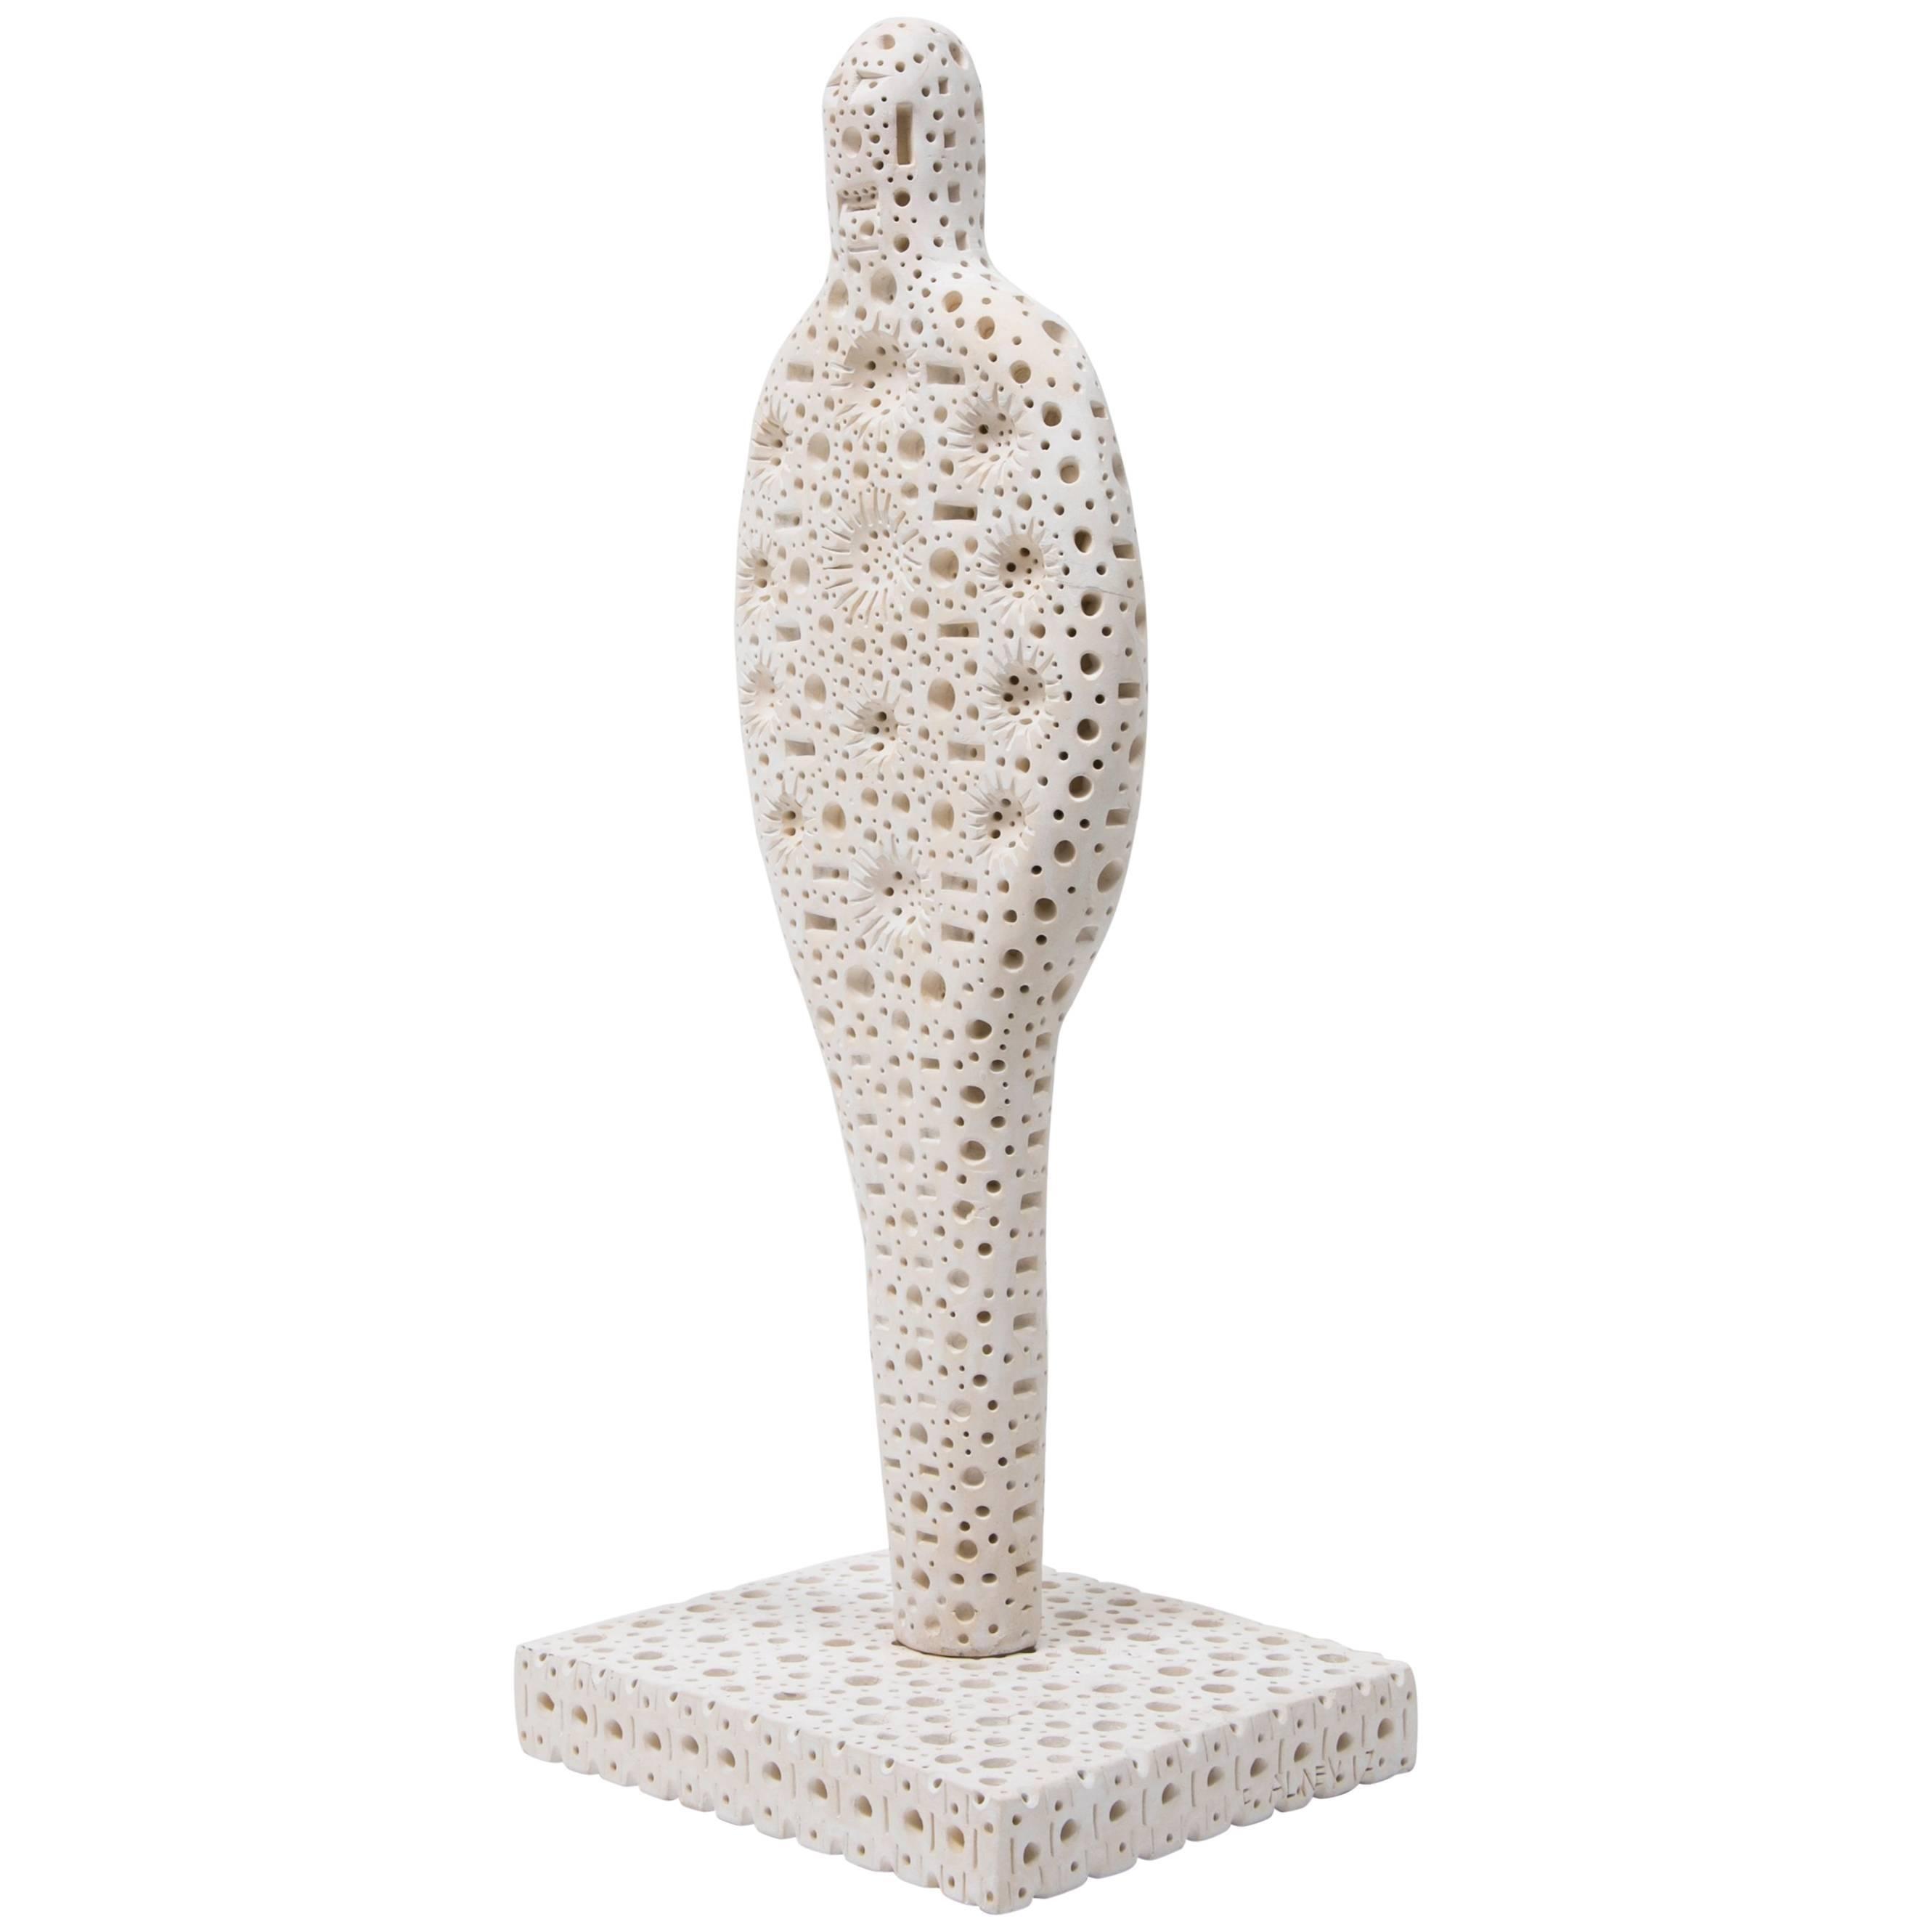 White Terracotta Sculpture by Alexandre Ney